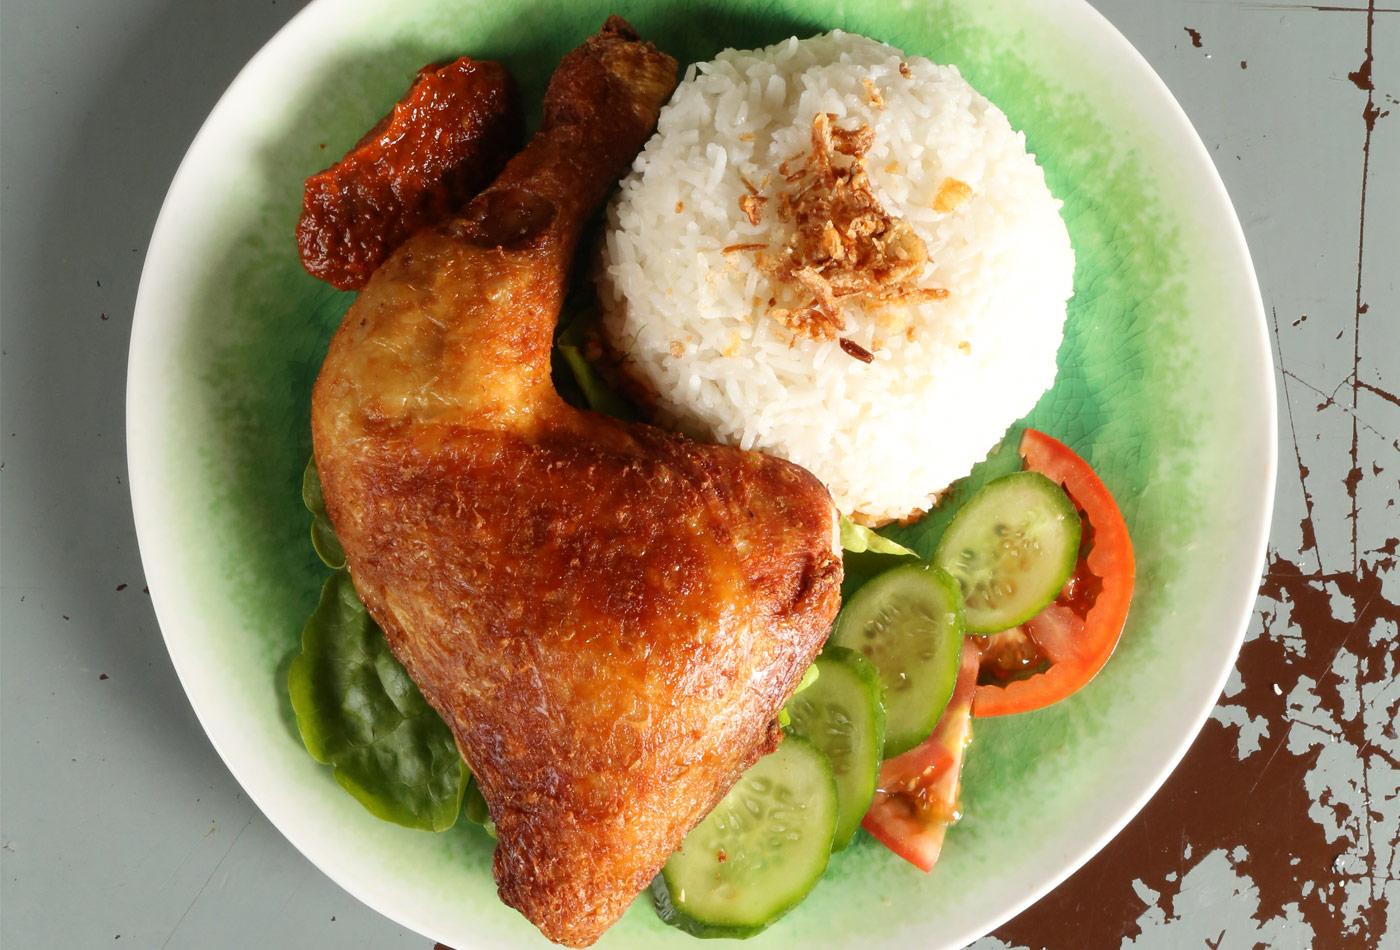 Warong Bali Sambal Ayam Goreng